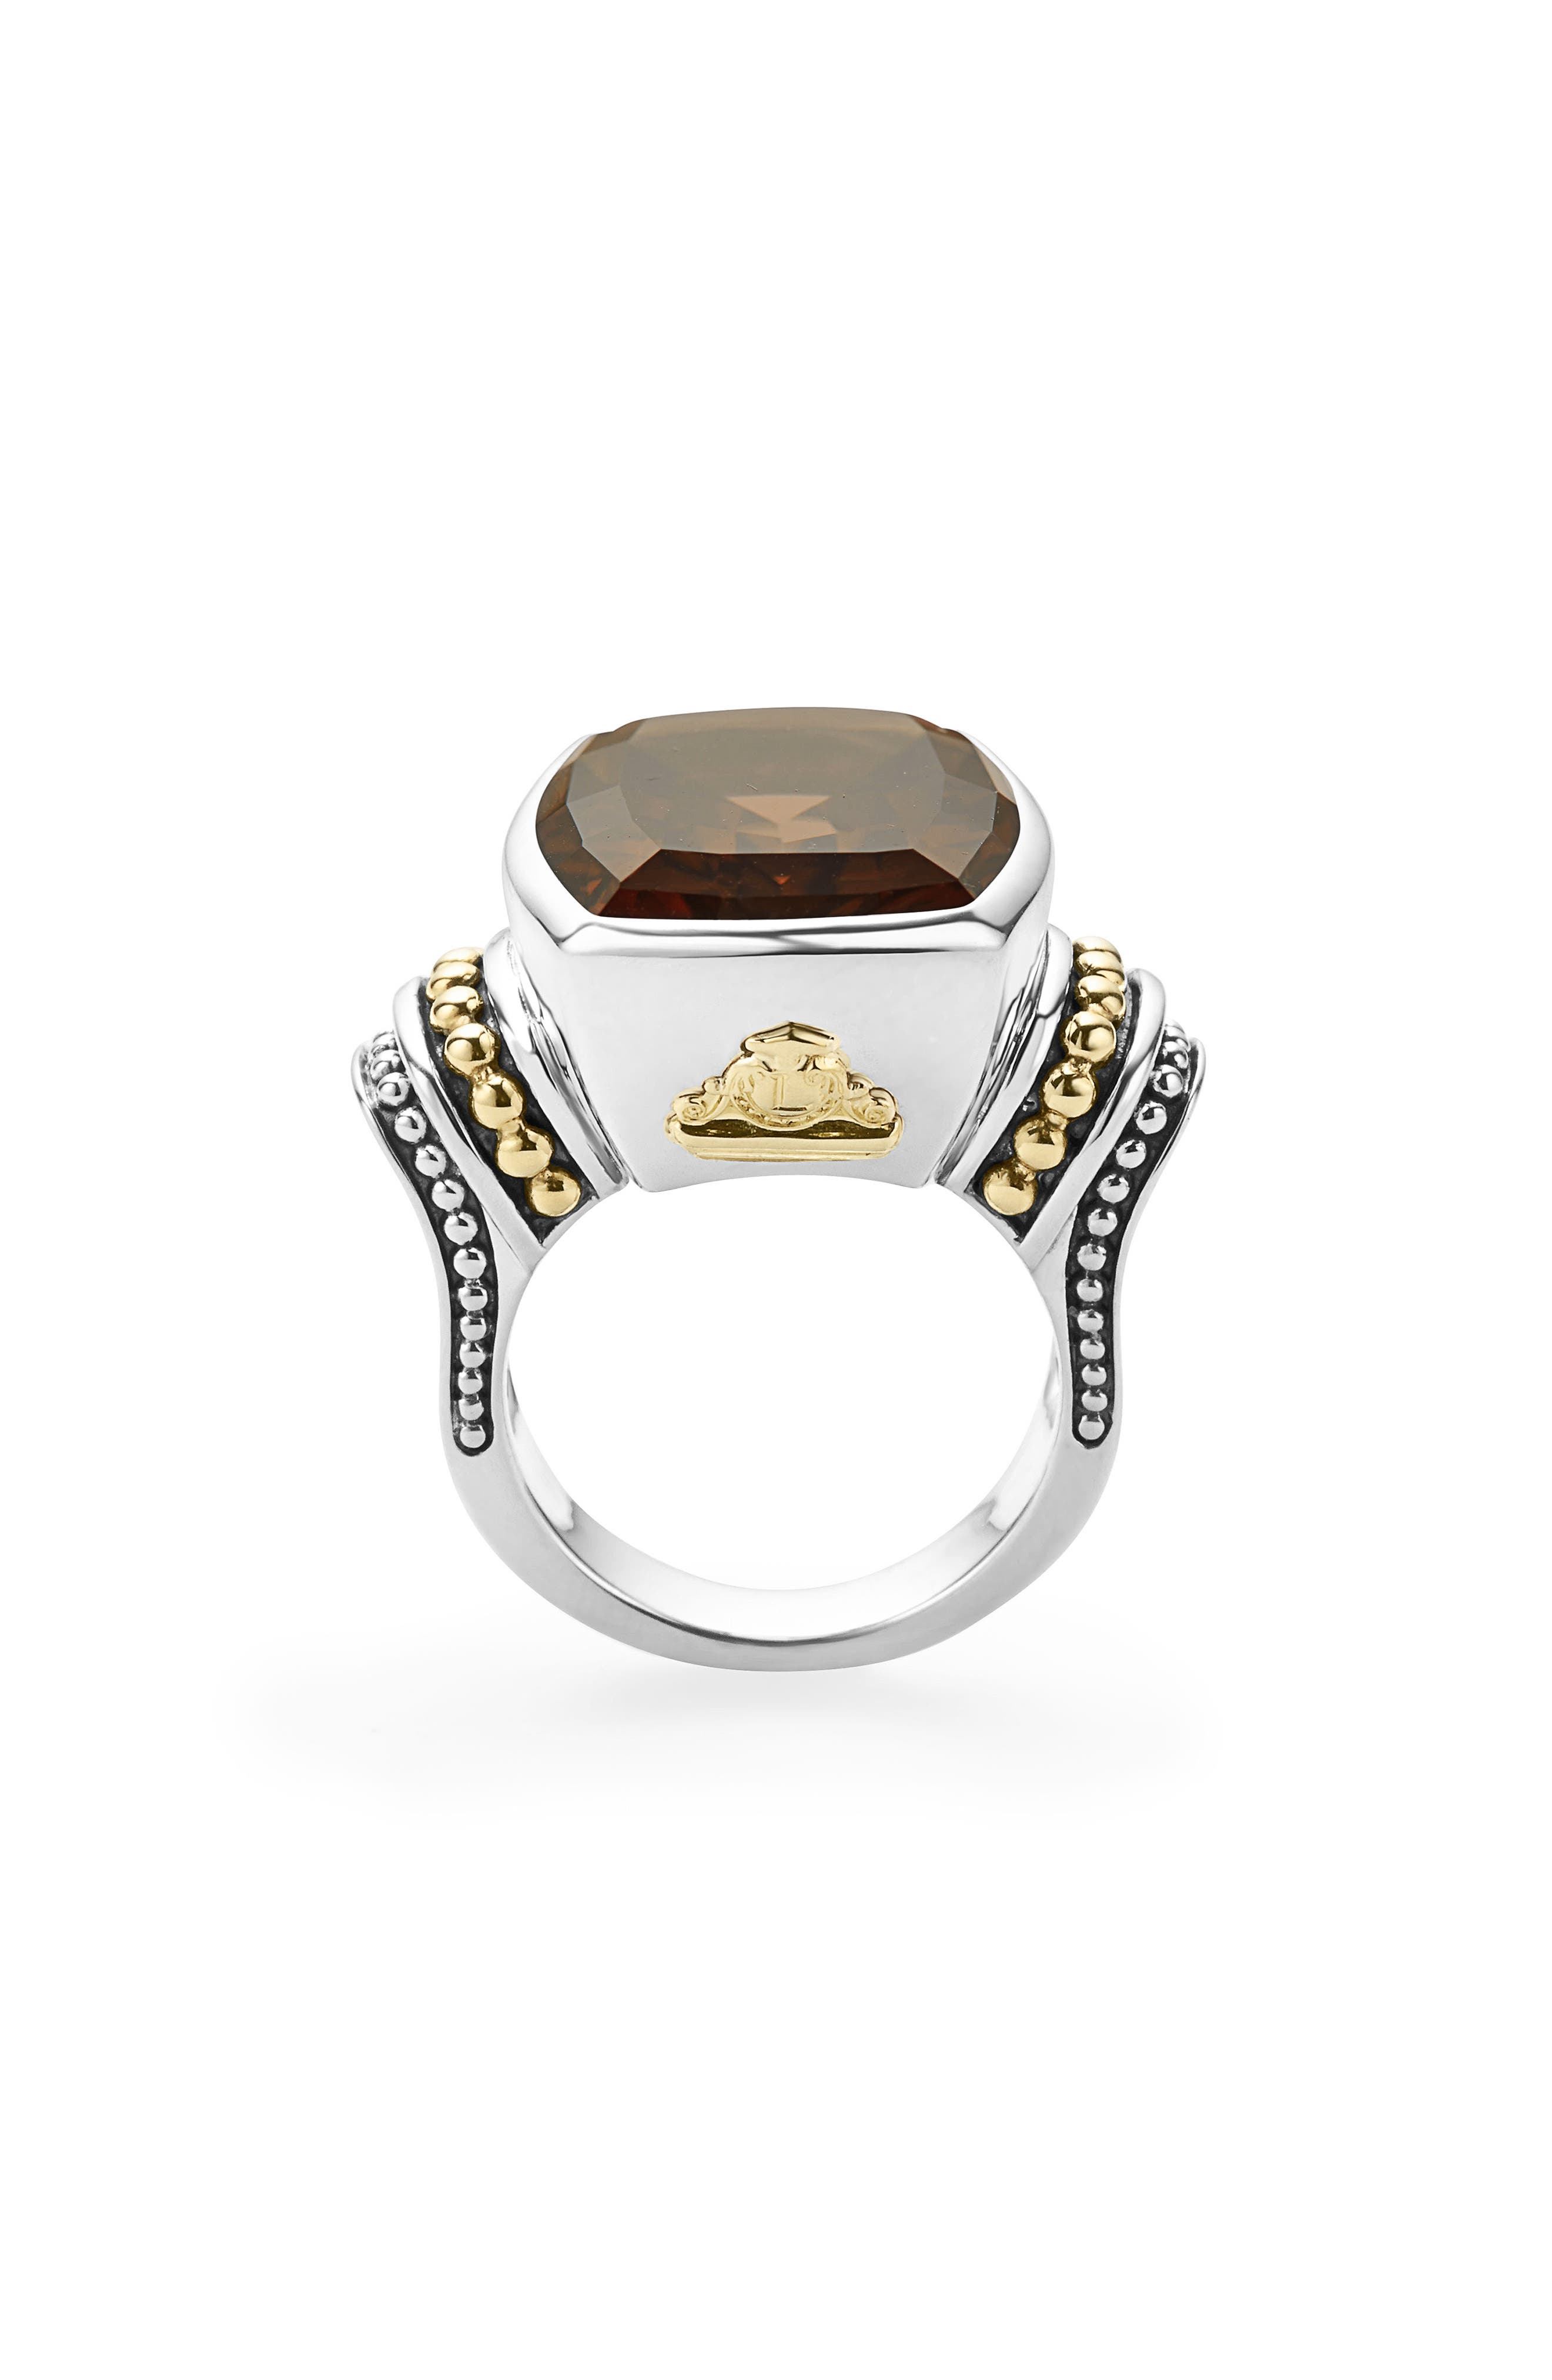 'Caviar Color' Large Semiprecious Stone Ring,                             Alternate thumbnail 3, color,                             Smokey Quartz